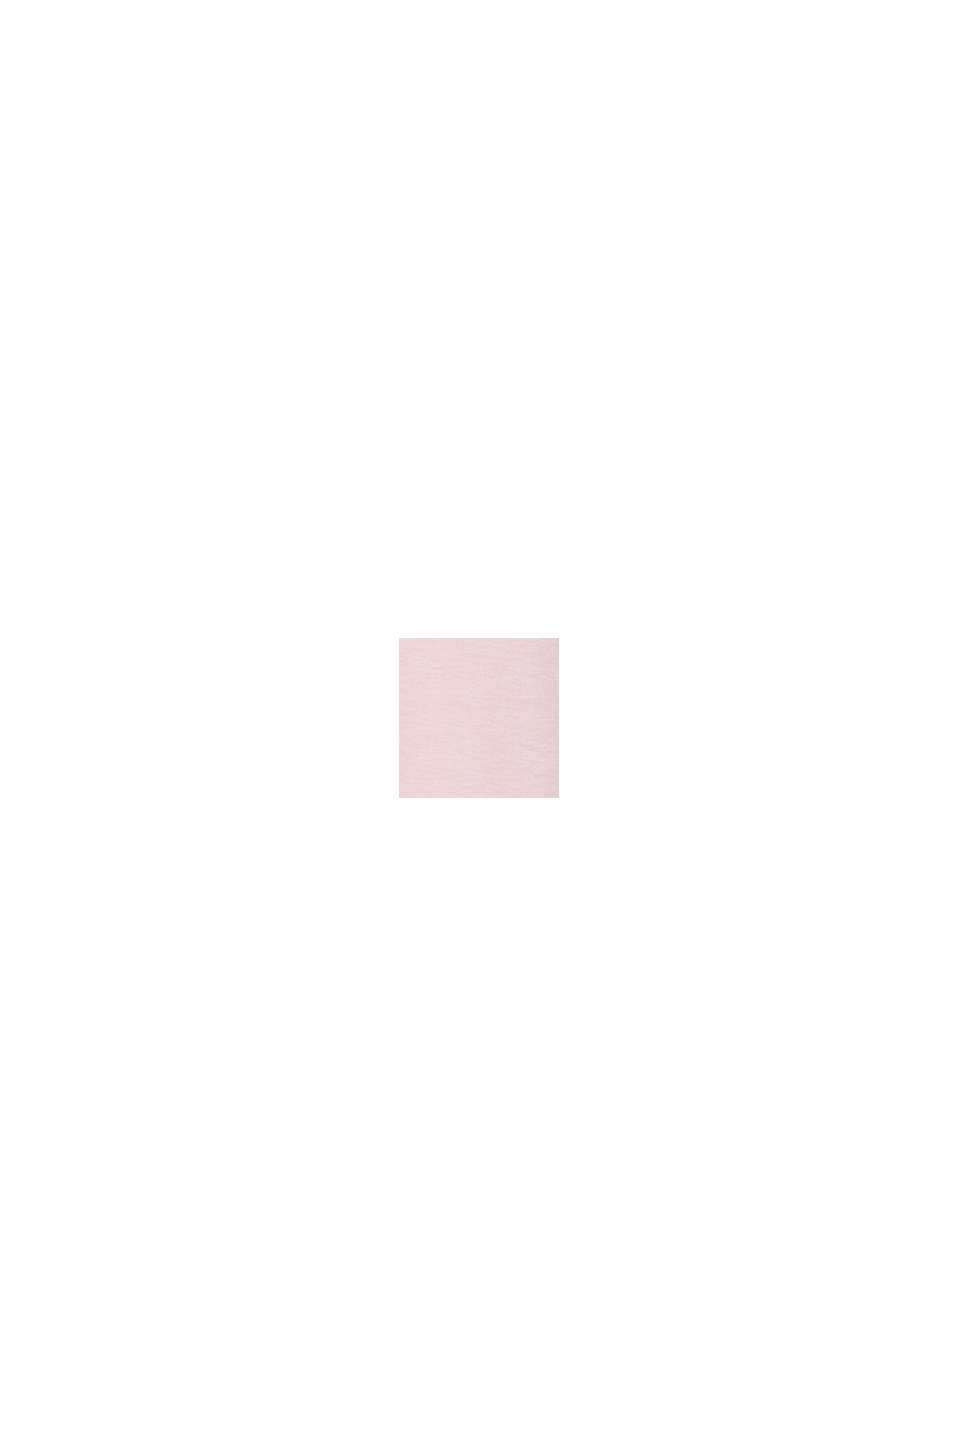 CURVY Maglia con stampa di scritta, LIGHT PINK, swatch